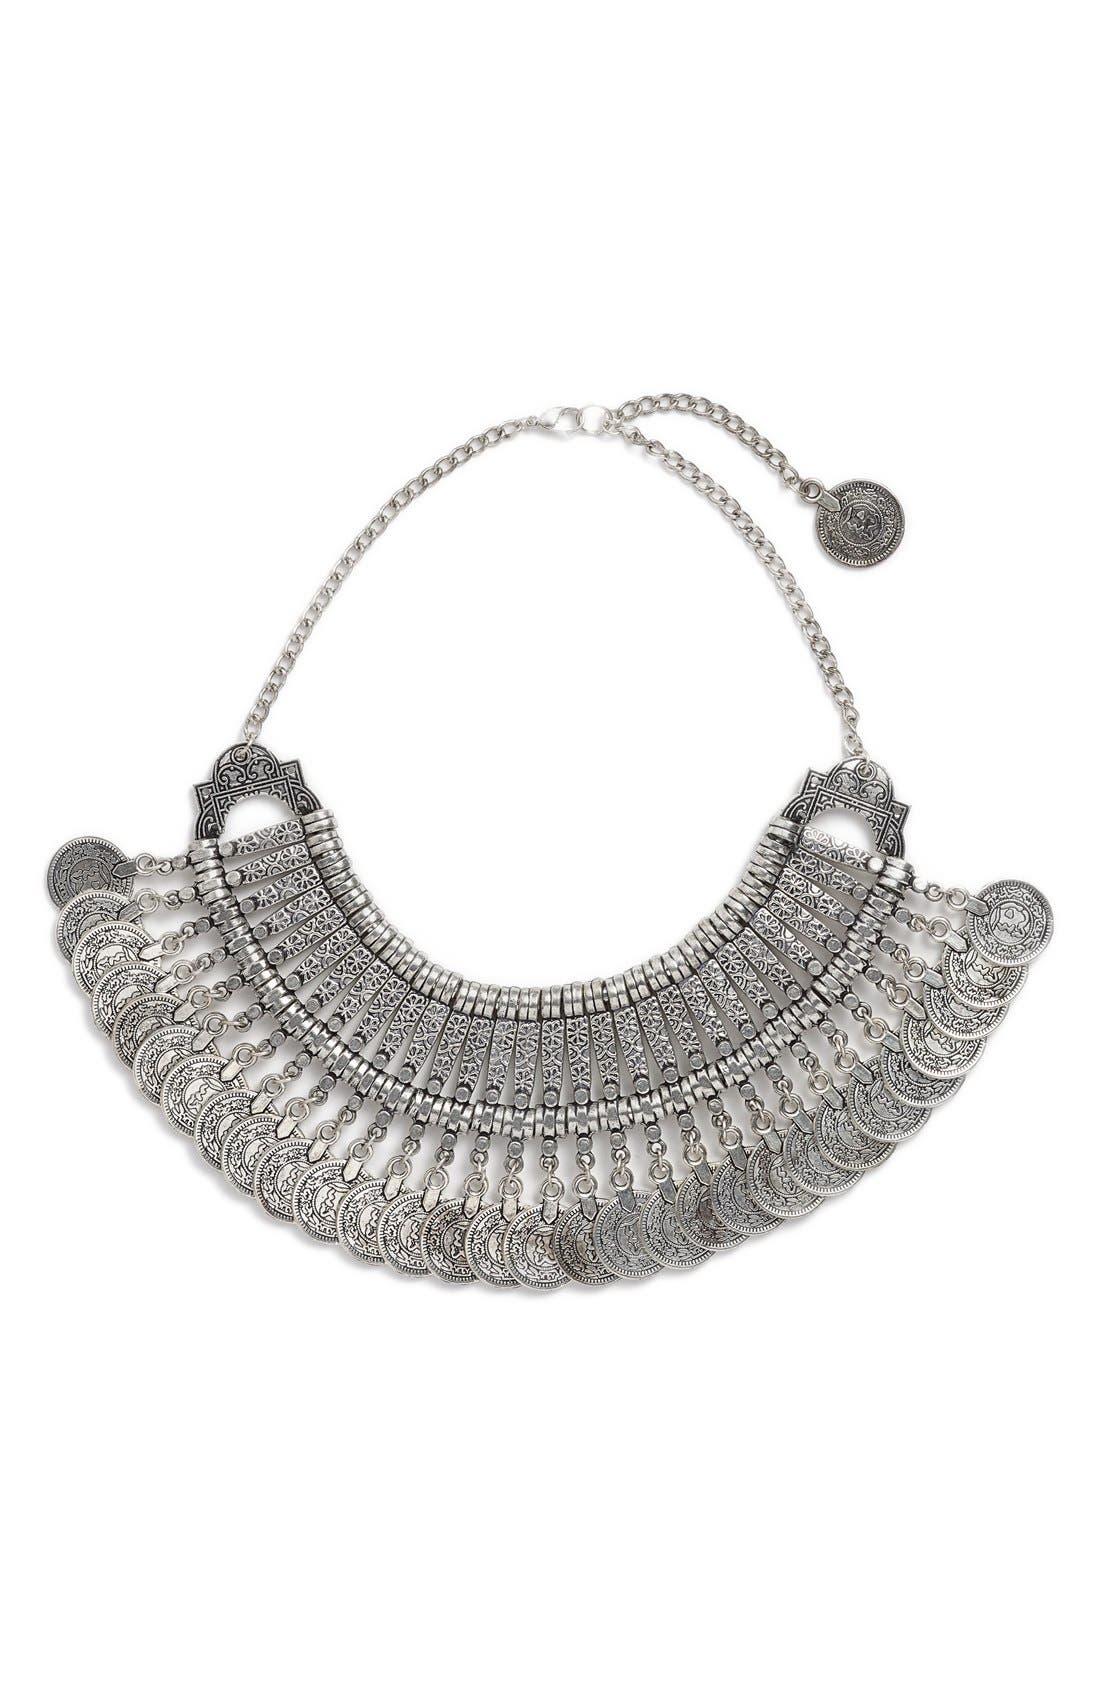 Alternate Image 1 Selected - Raga 'Gypsy Coin' Bib Necklace